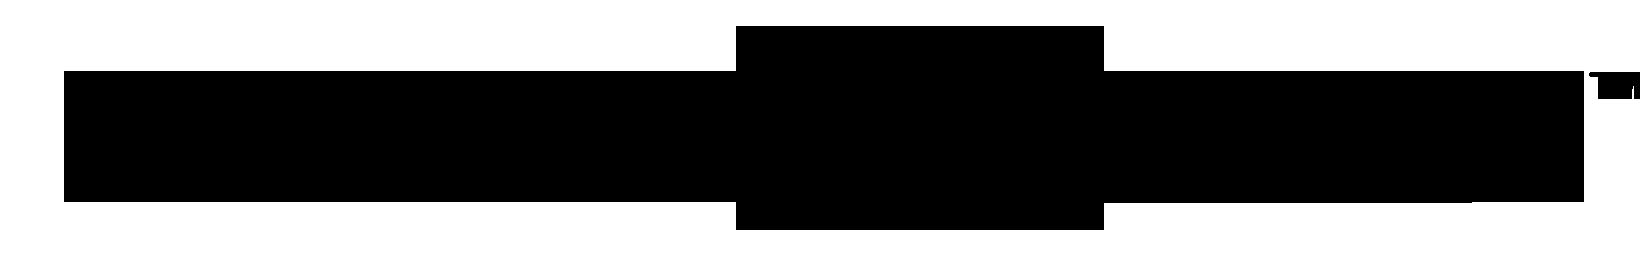 bqlogotestb-1.png